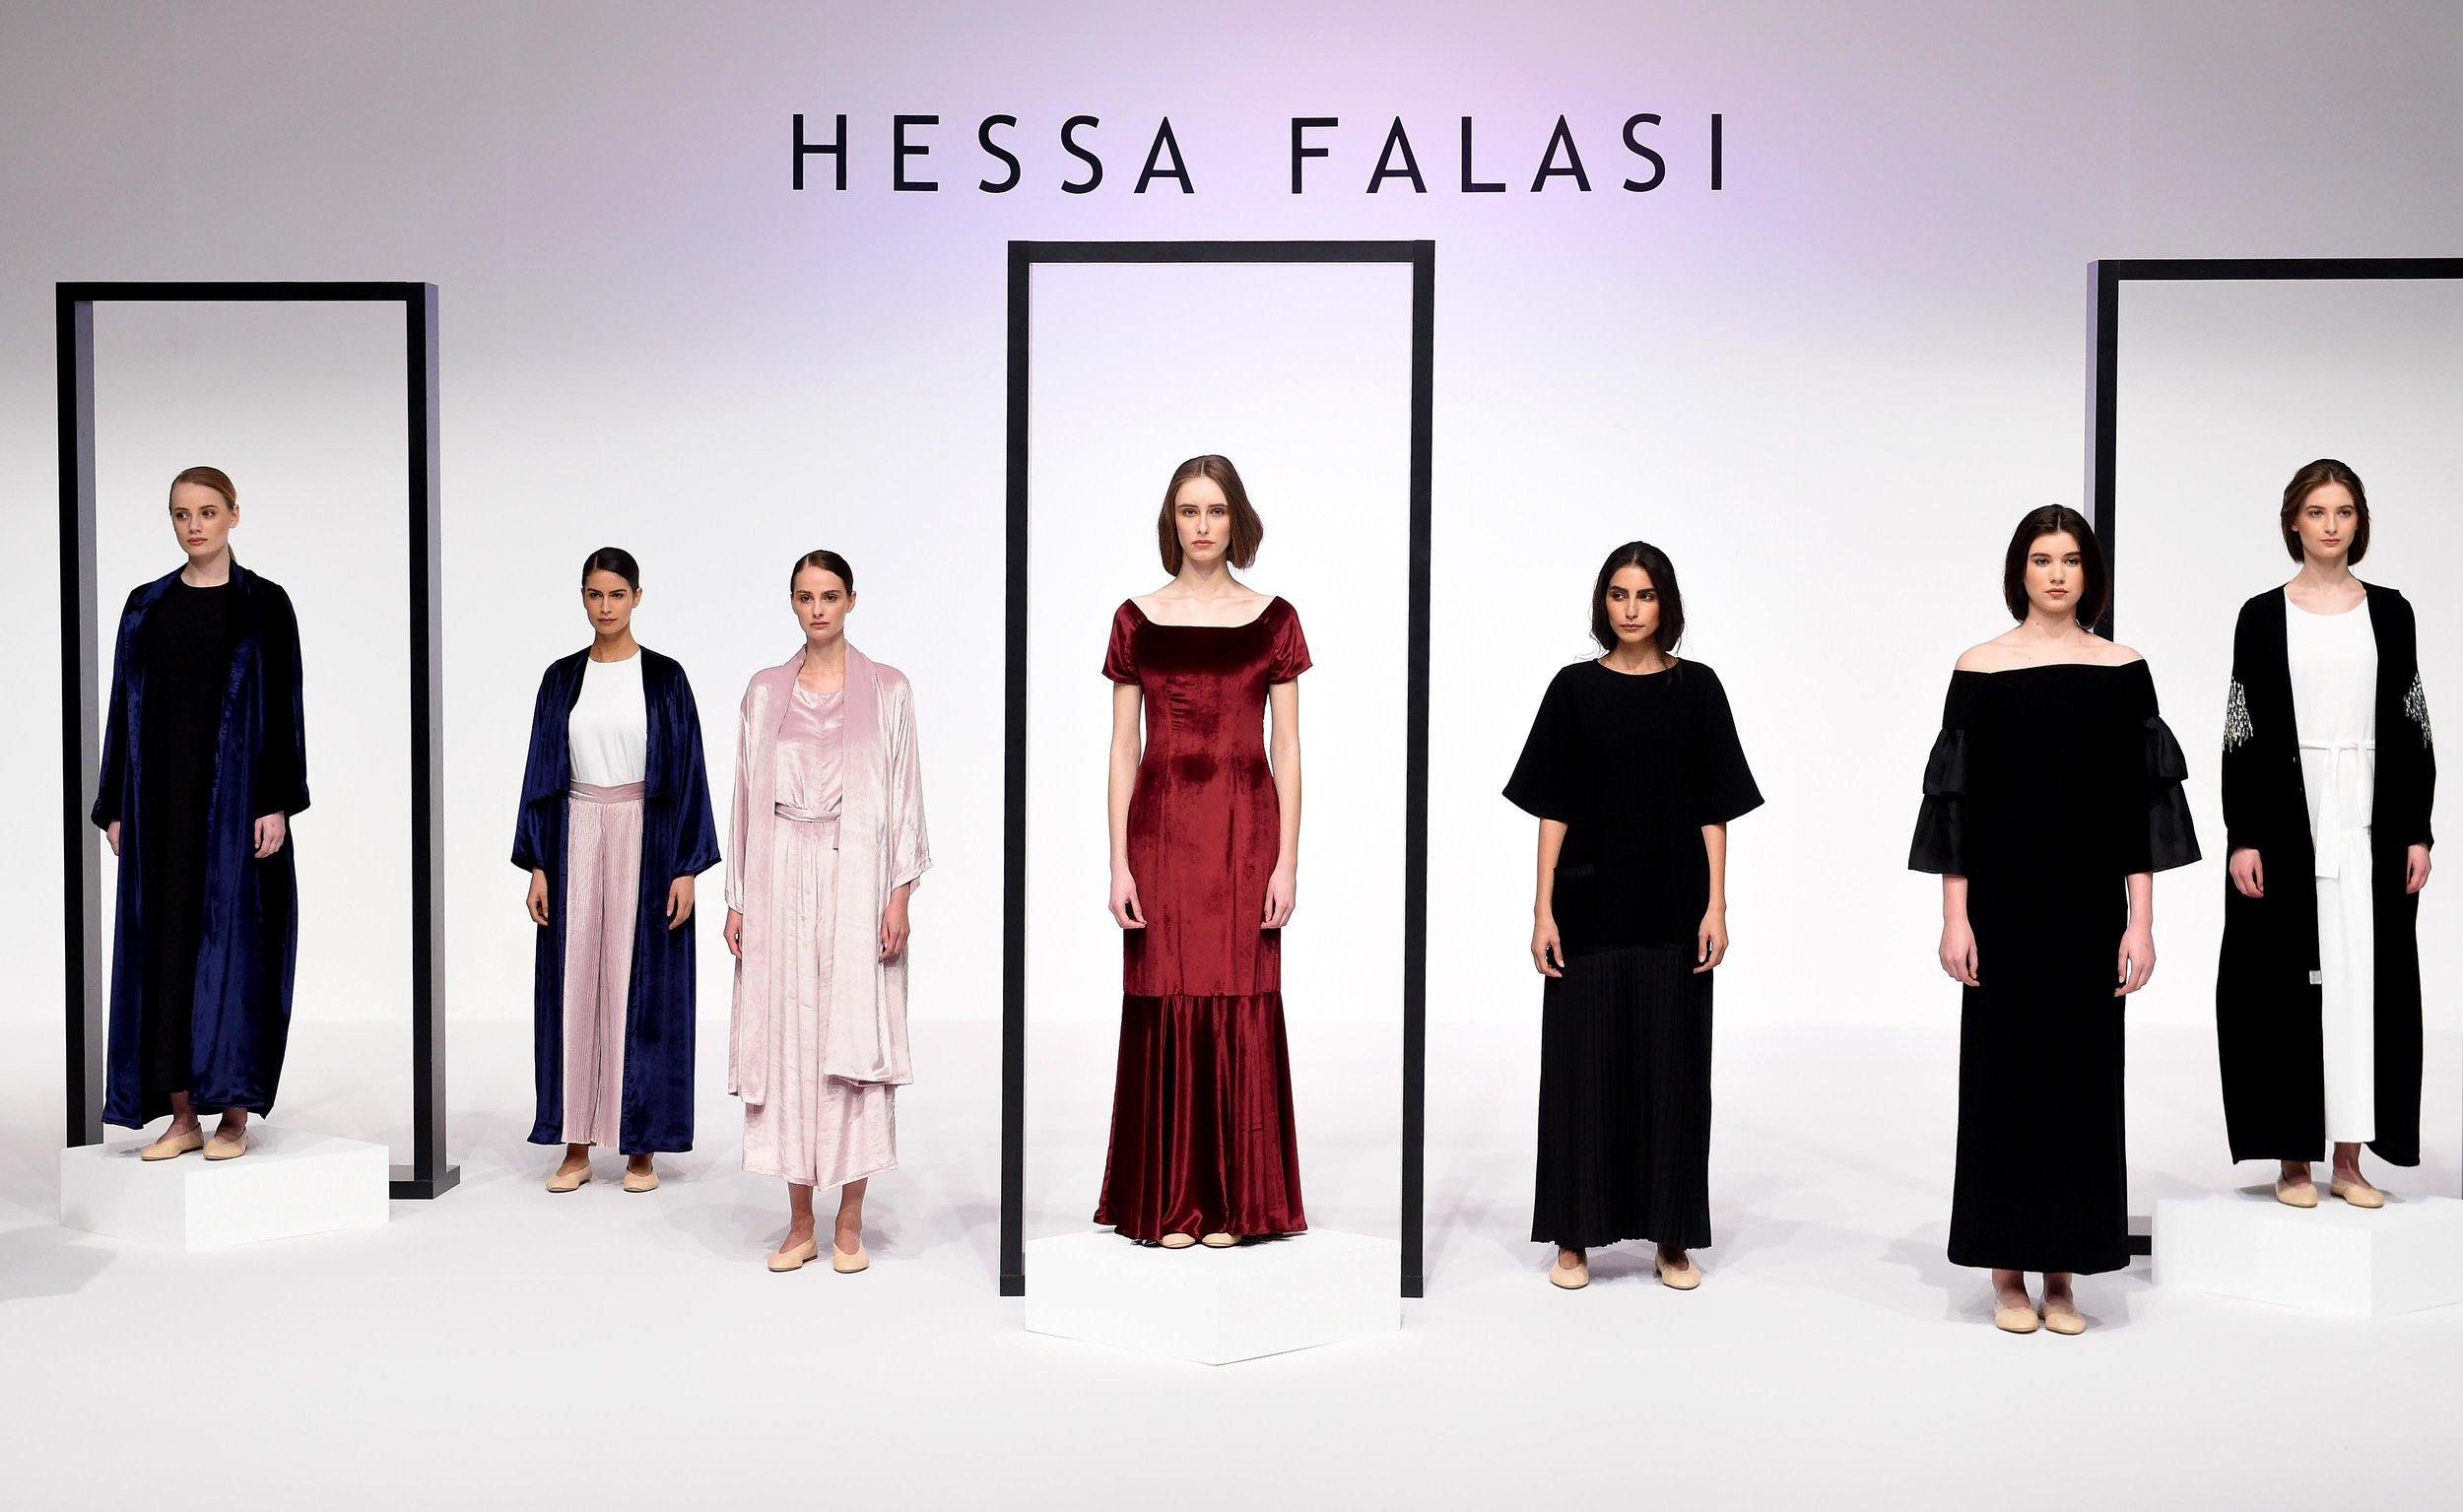 FFWD_Hessa Falasi_078.jpg